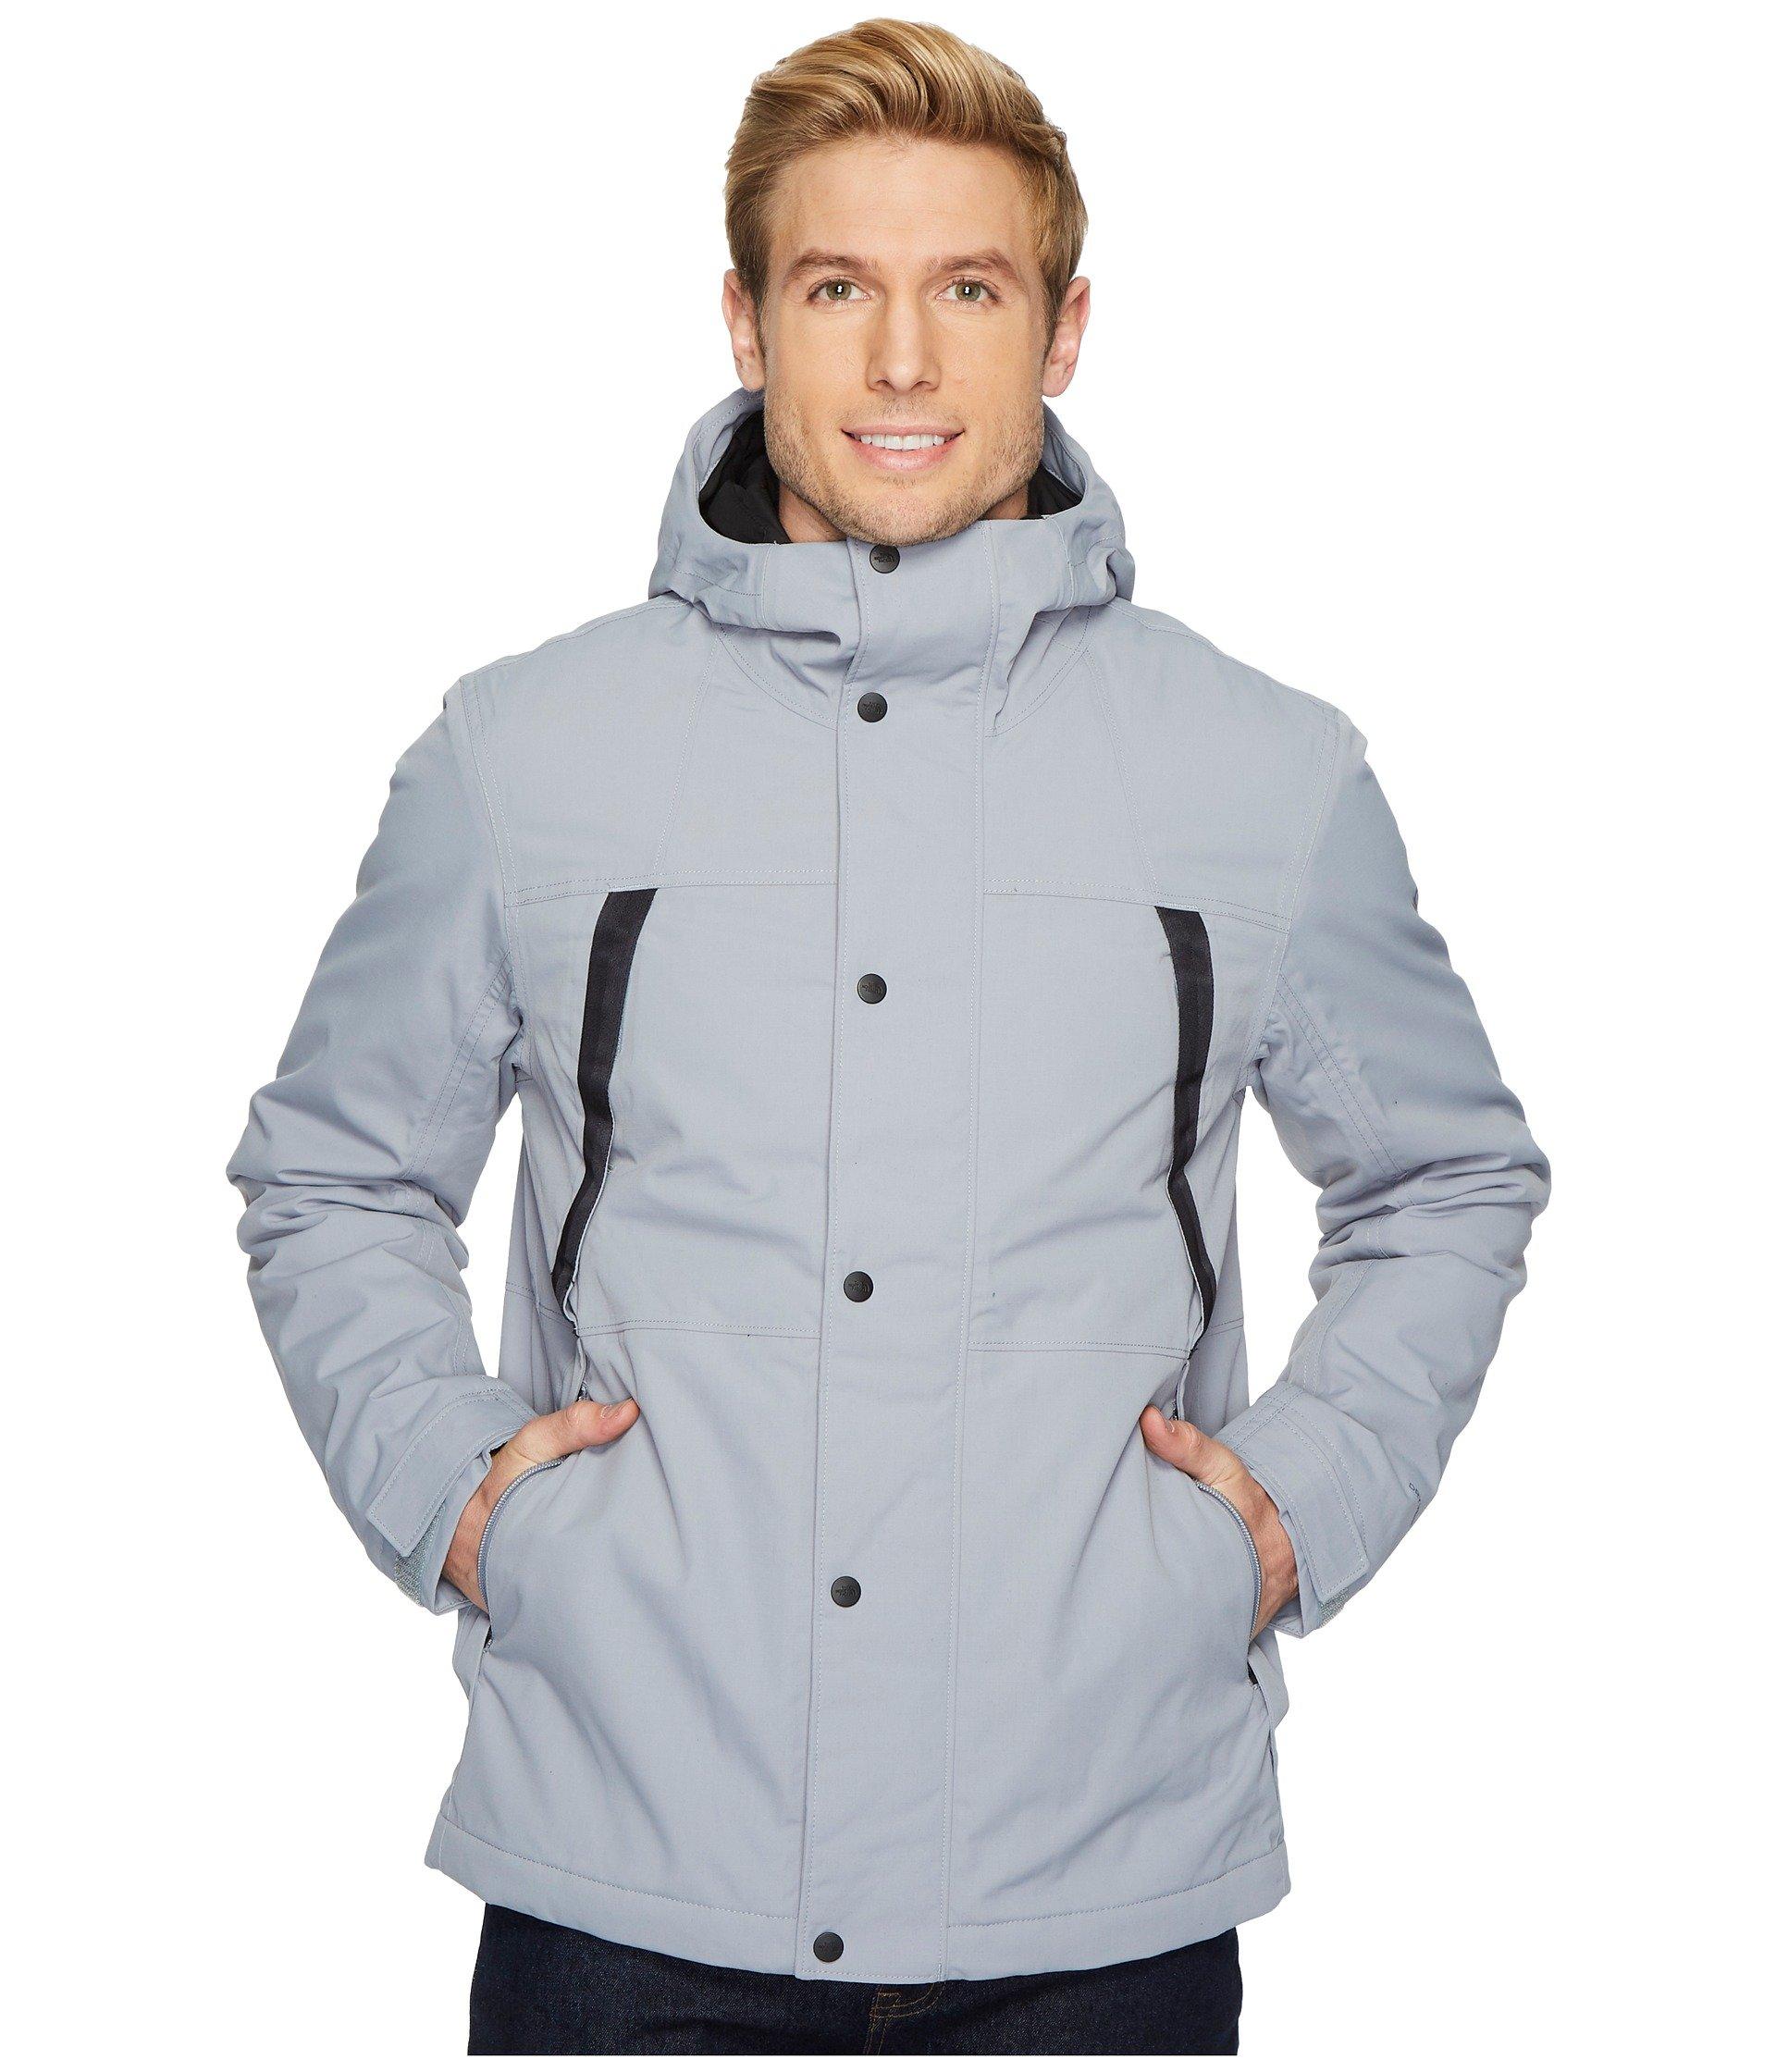 Stetler Insulated Rain Jacket